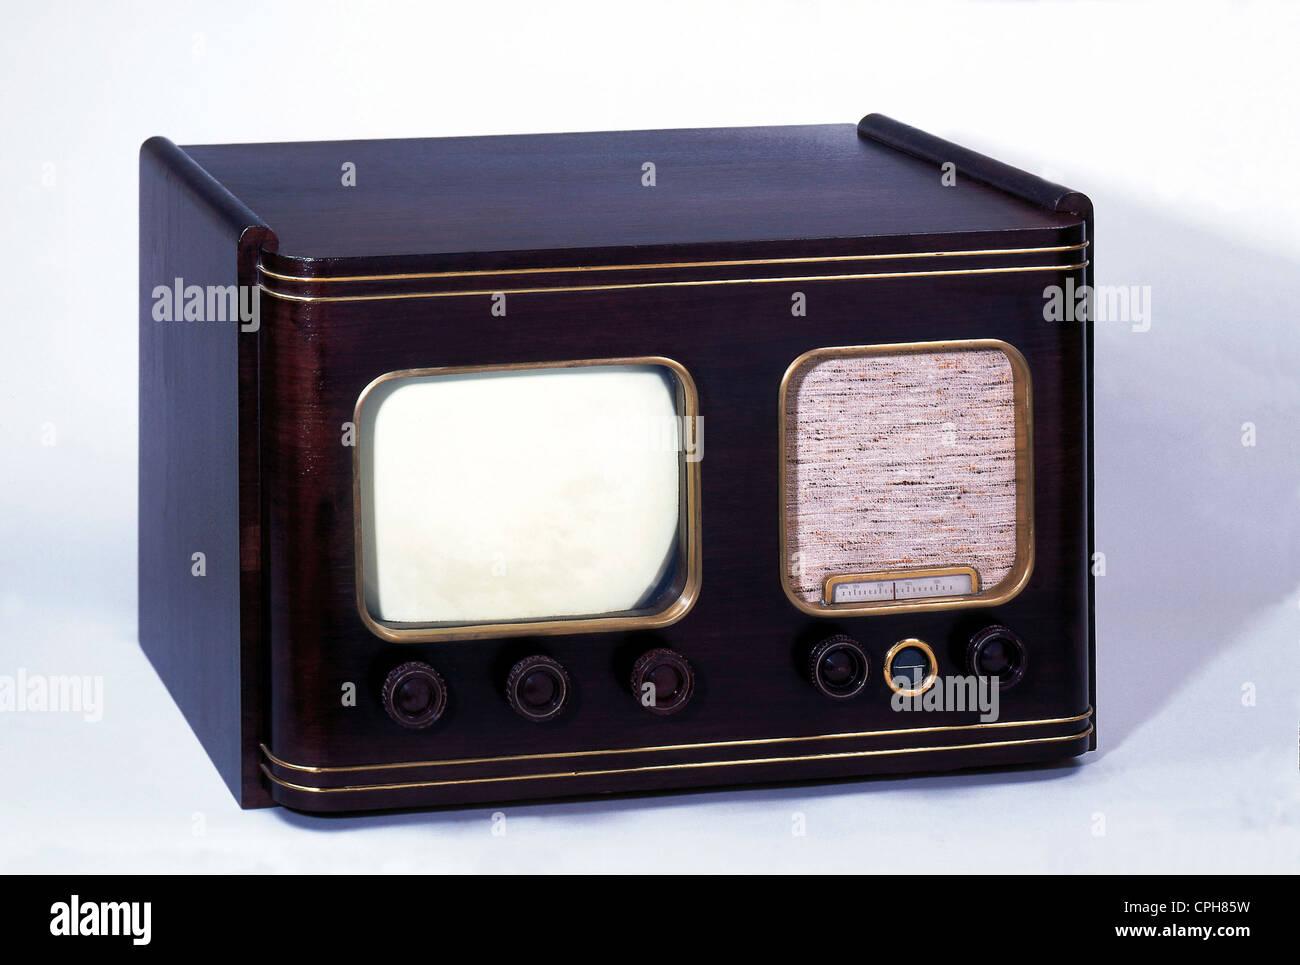 broadcast, television, television set of the C. Lorenz Company, TV set 6 P 515, pre-version, produced circa 1951, - Stock Image